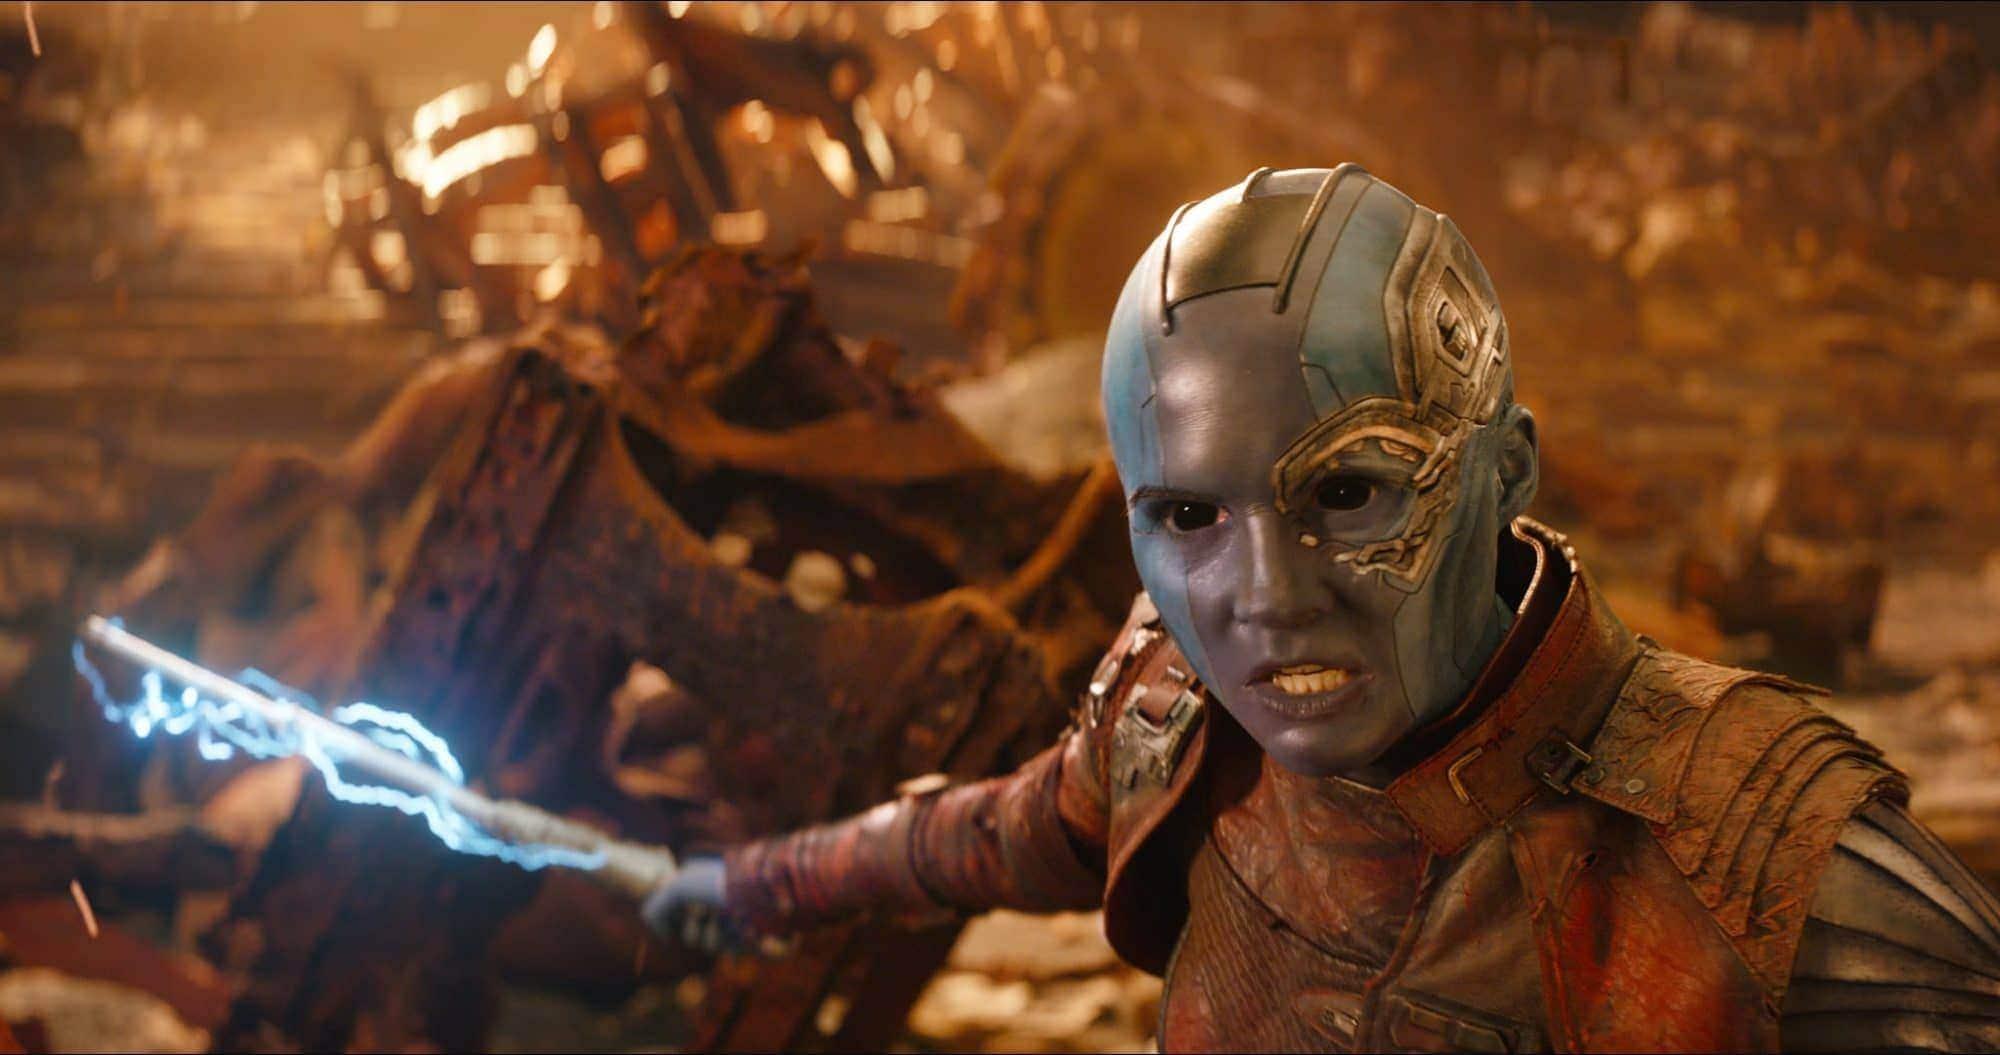 - tmp JUb2P7 ed837e6699734a0d InfinityWar5ae28175ce3f0 - Karen Gillian สาวสุดแซ่บในบท Nebula จาก Guardians of The Galaxy